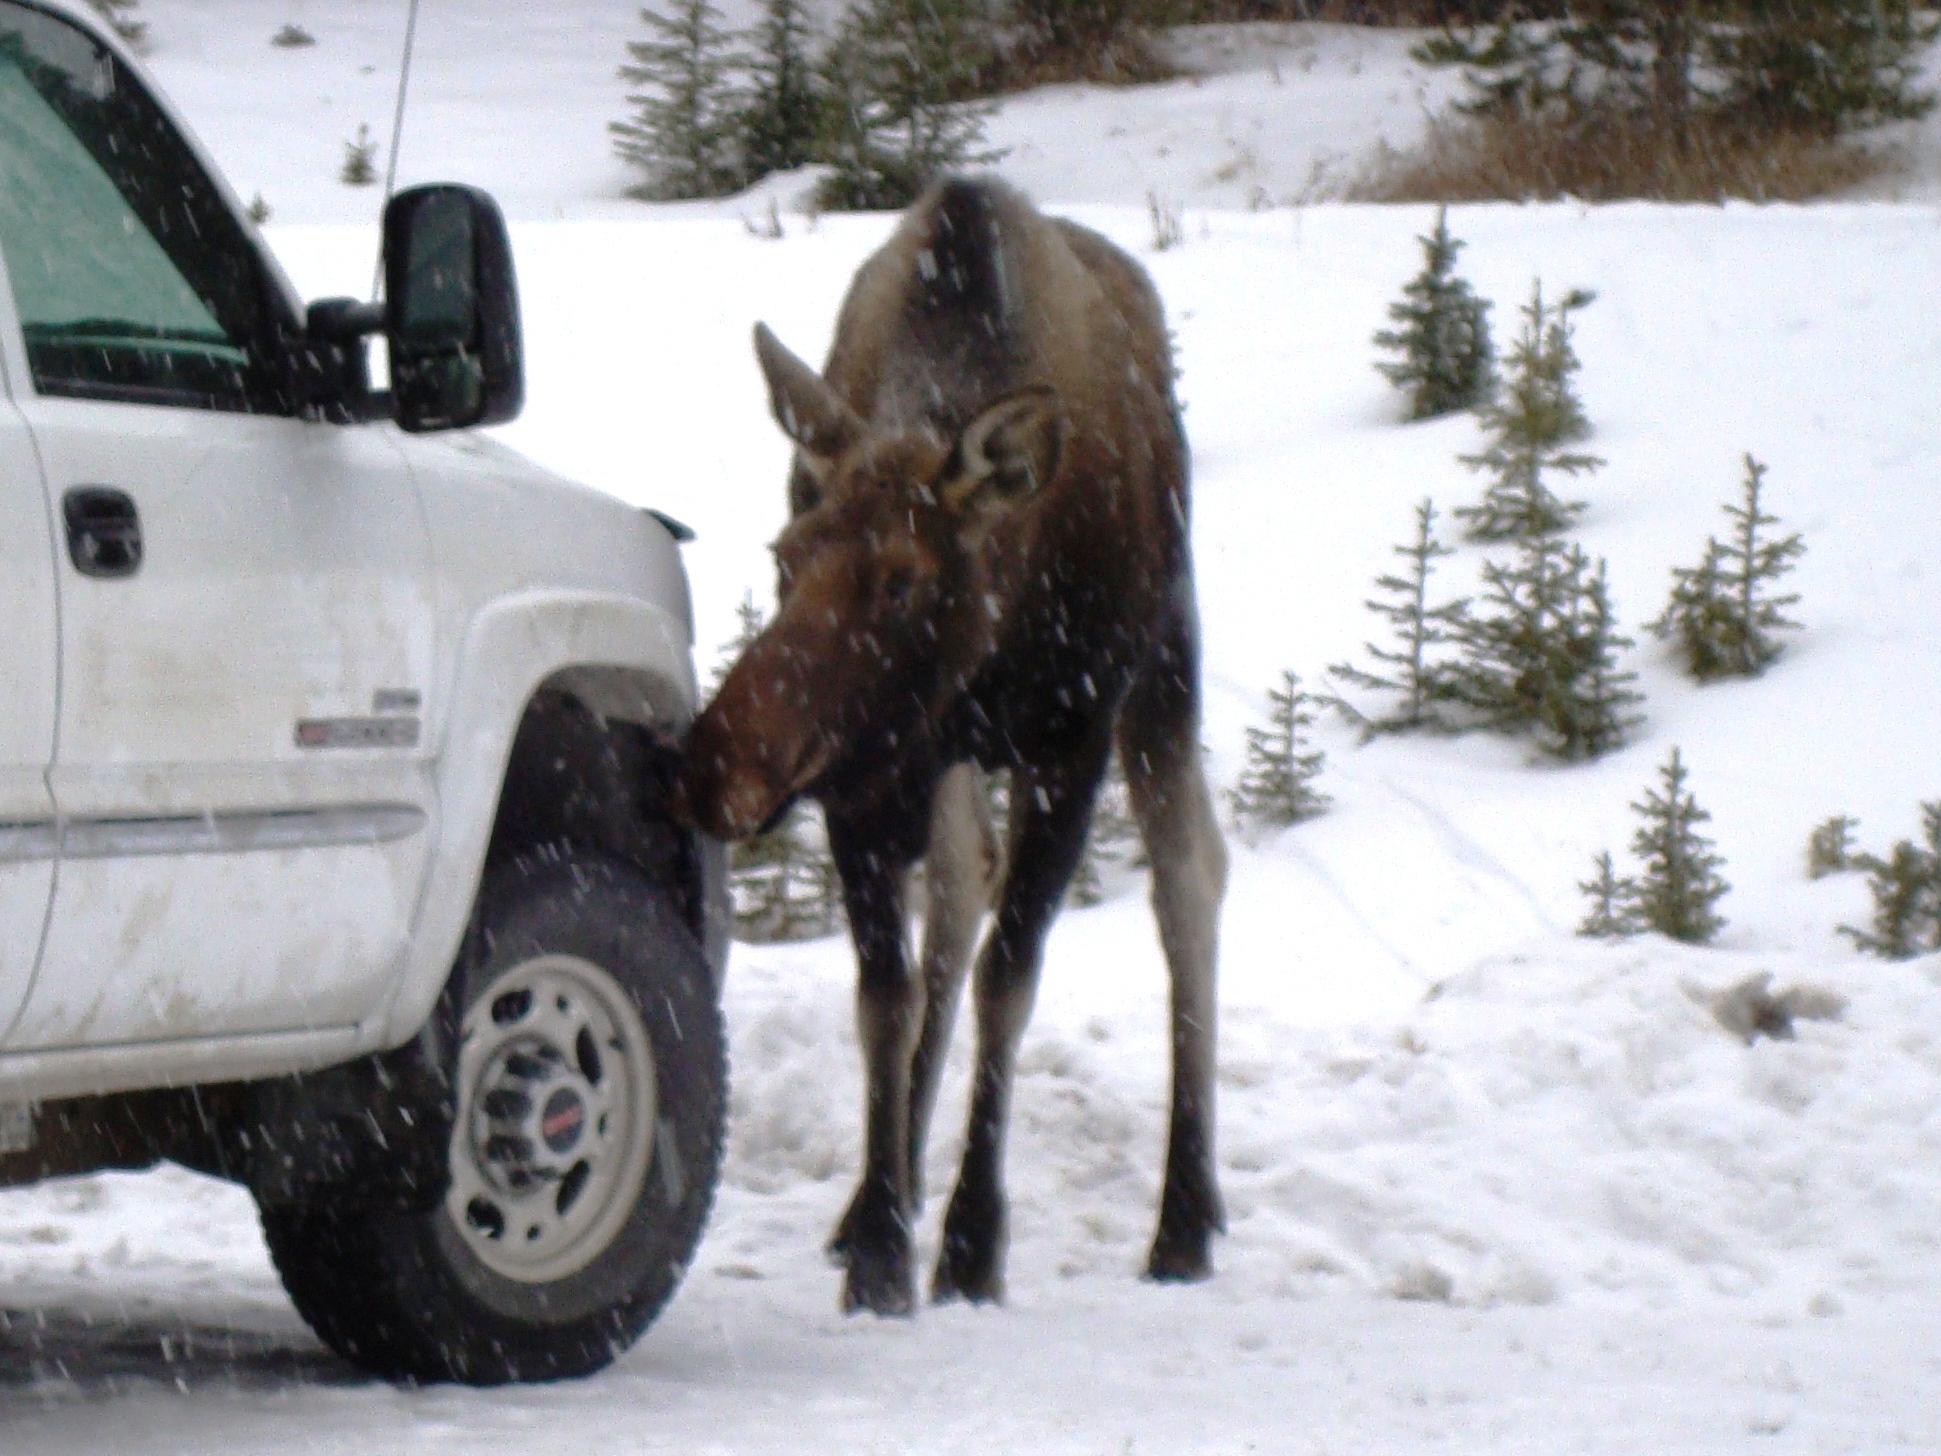 Moose licking salt in Chester lake parking lot